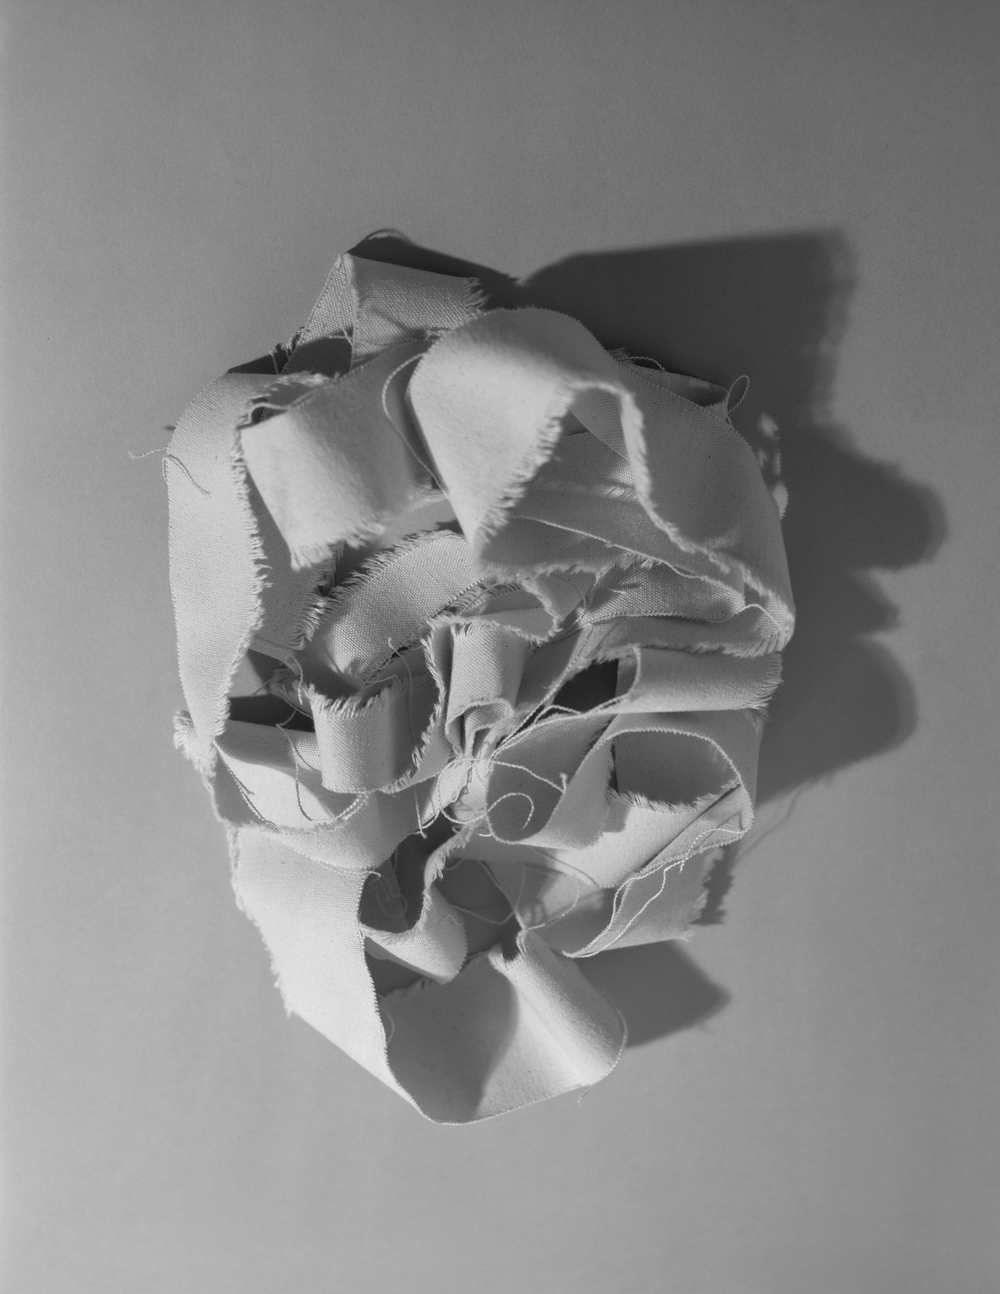 V (The Head),C-Print, 17 x 22 inches, 2011